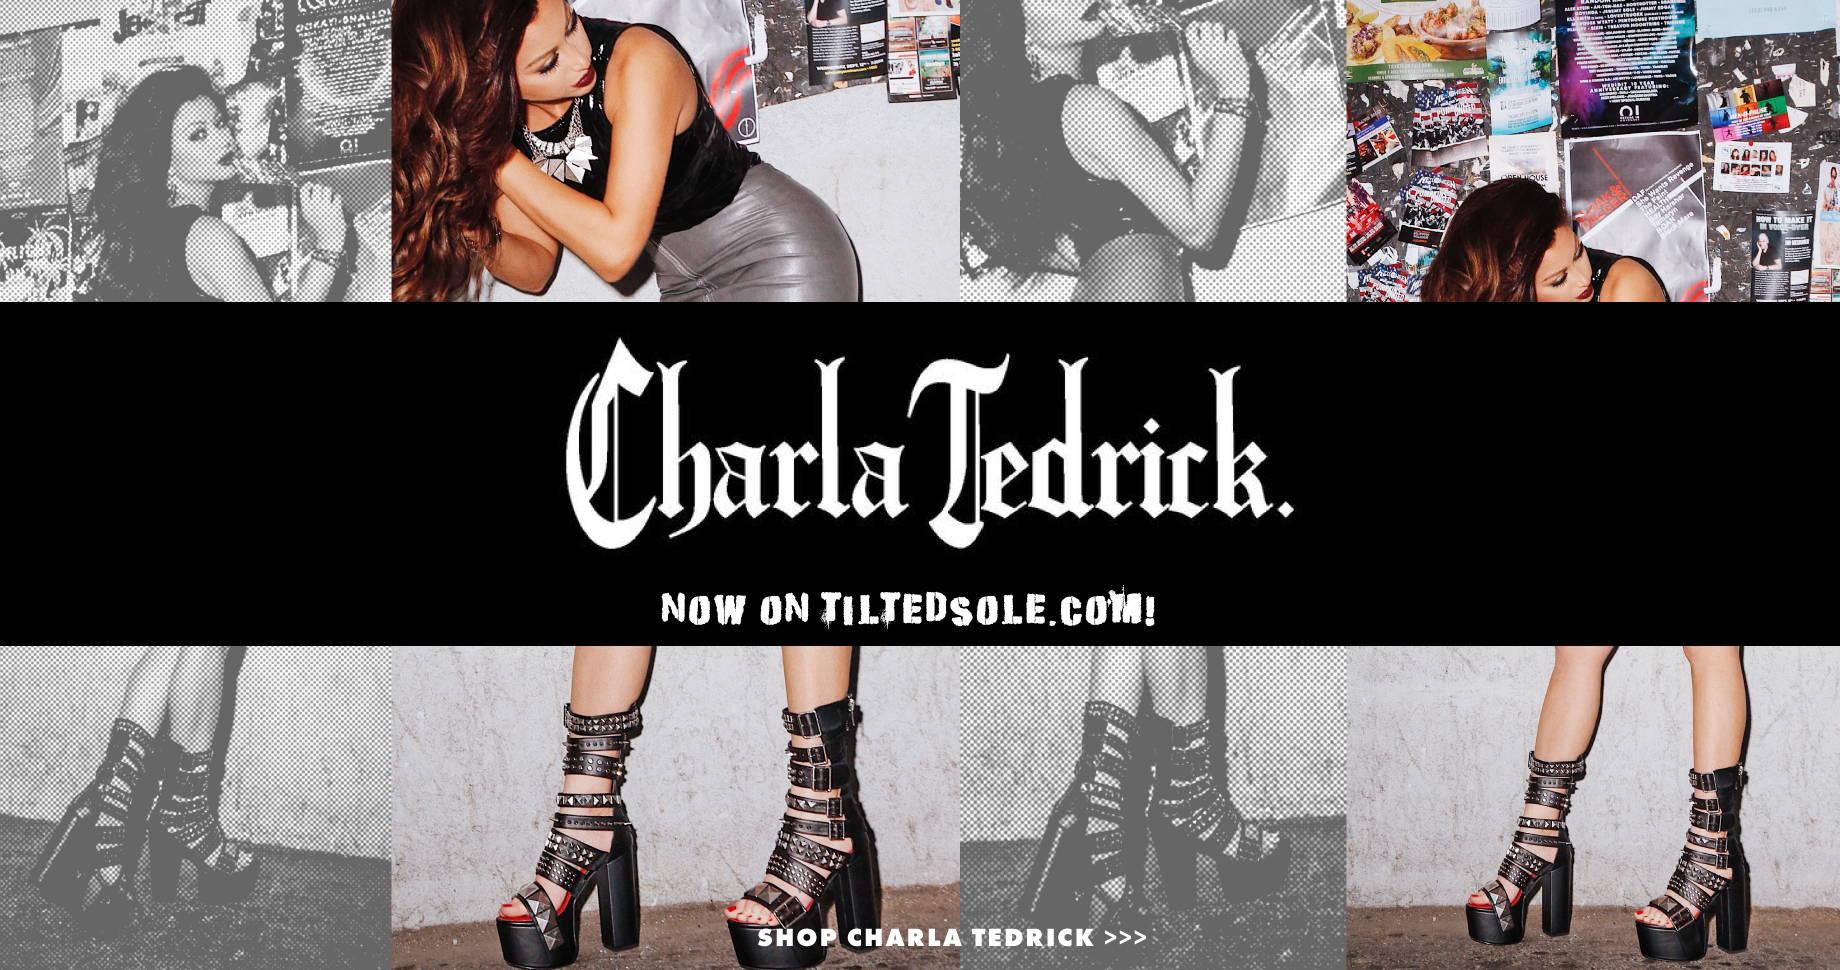 Charla Tedrick Now On Tiltedsole.com | Shop Charla Tedrick